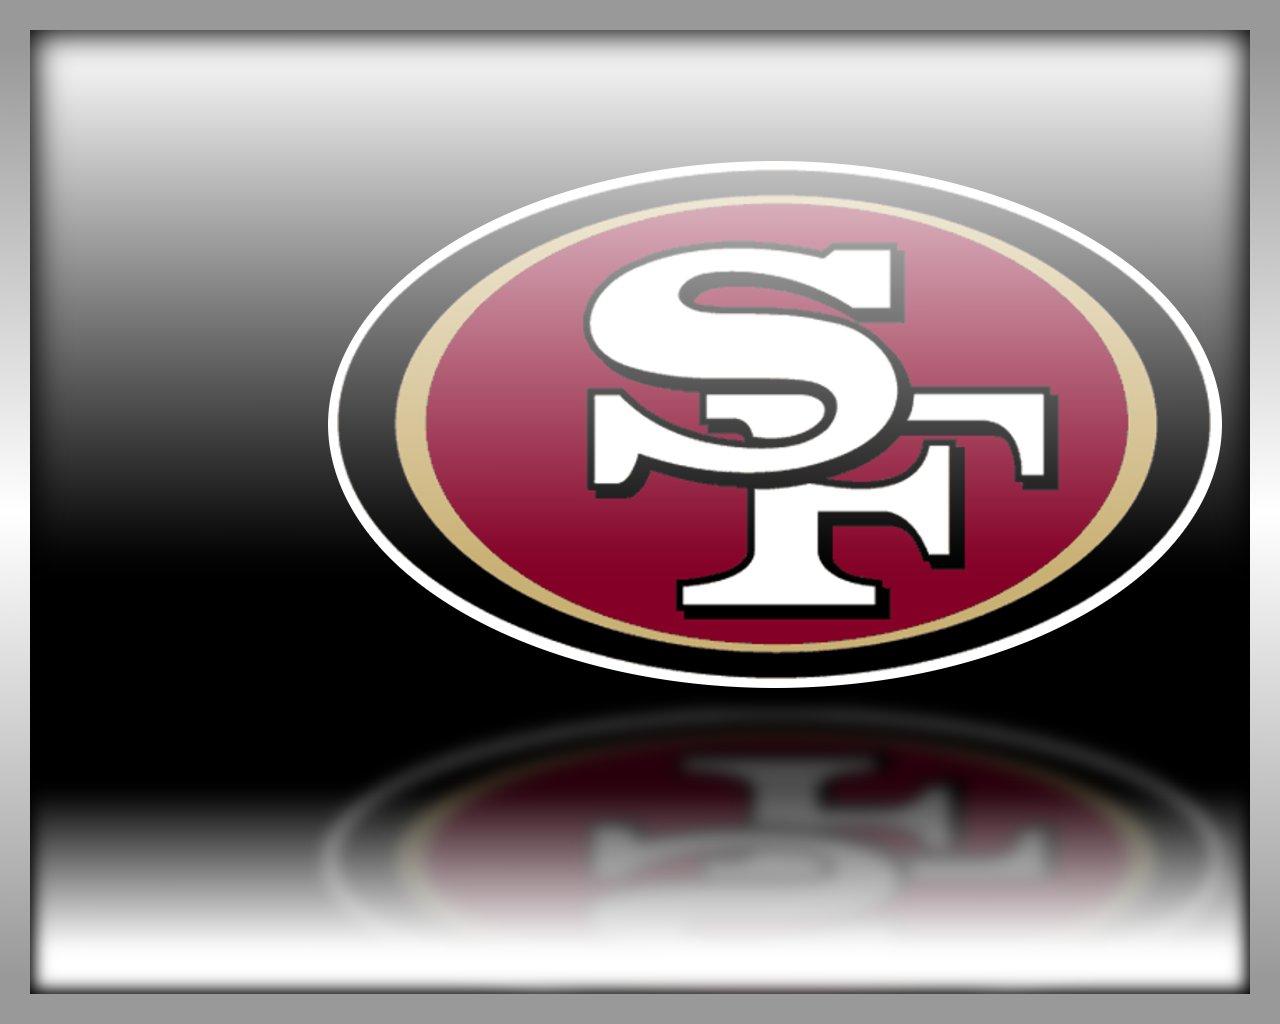 San Francisco 49ers desktop wallpaper San Francisco 49ers wallpapers 1280x1024